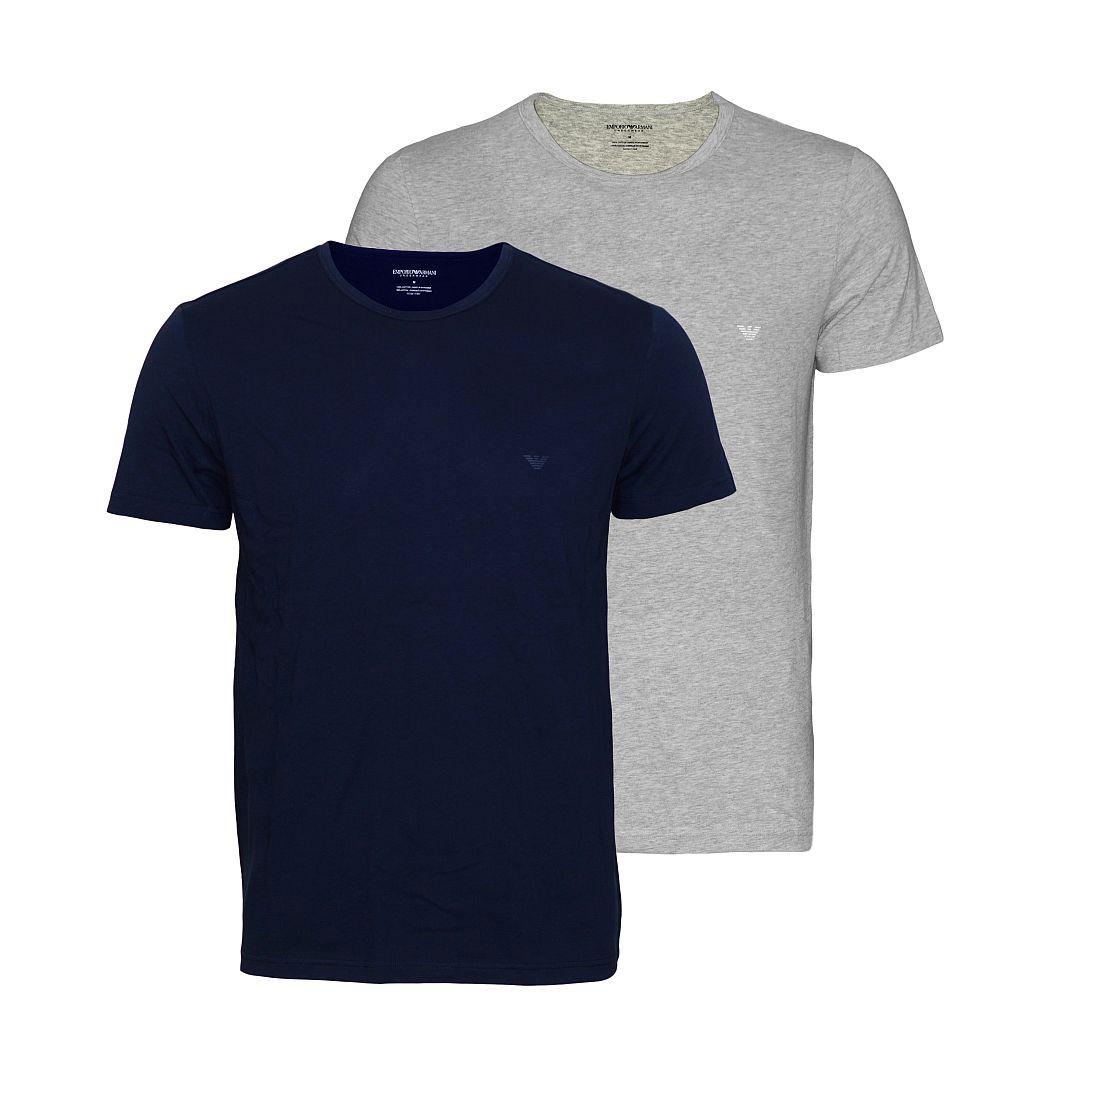 EMPORIO ARMANI 2er Pack Shirt T-Shirt navy grau CC722 111647 15935 HW16